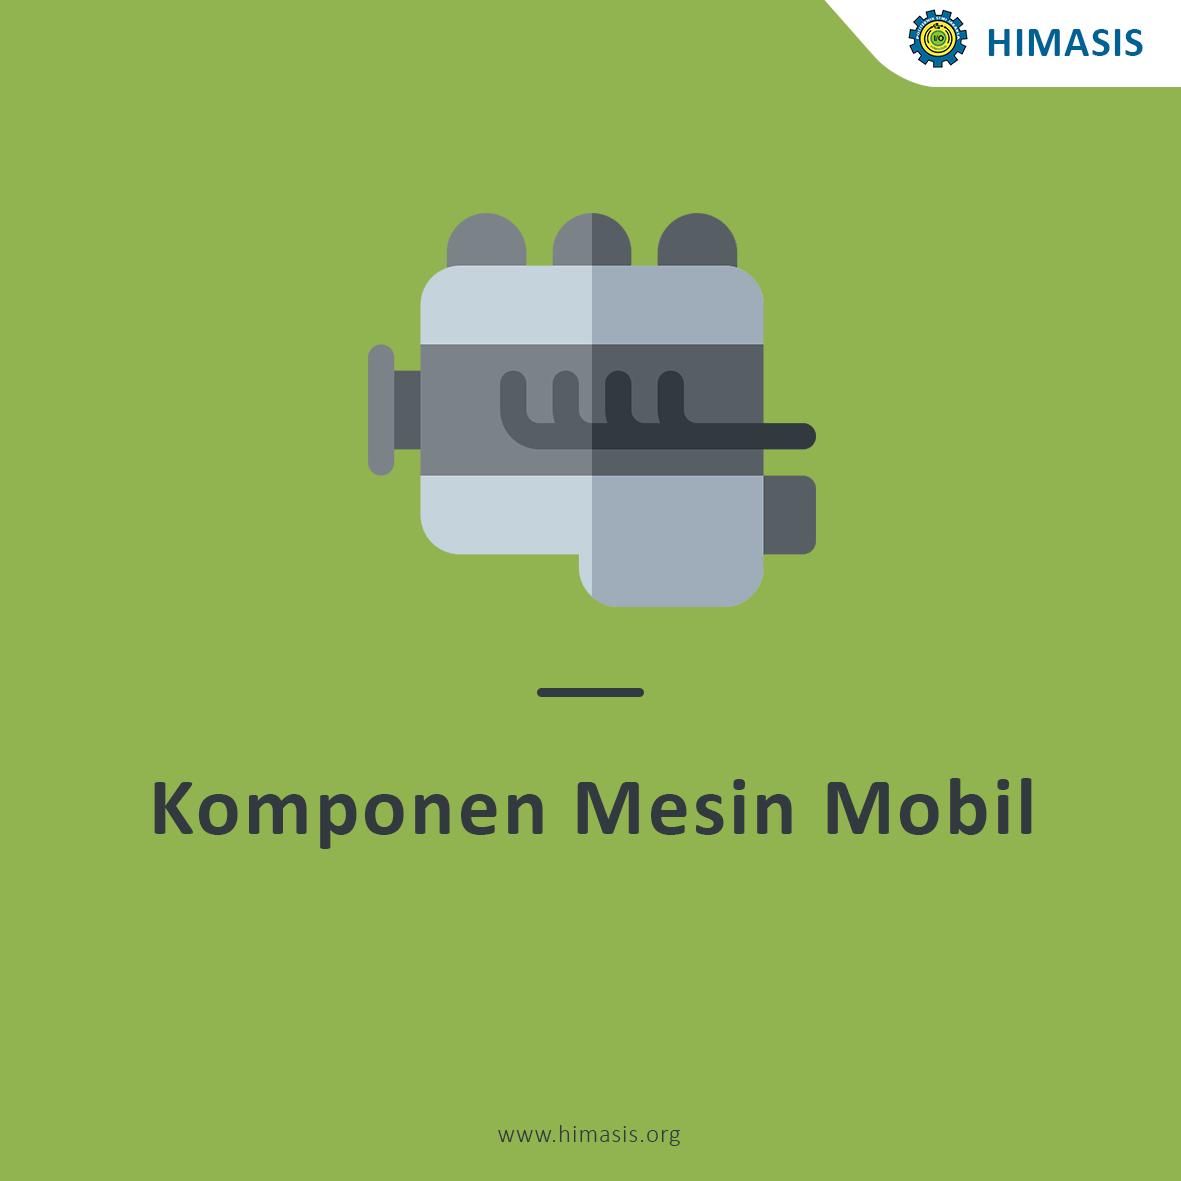 Komponen Mesin Mobil